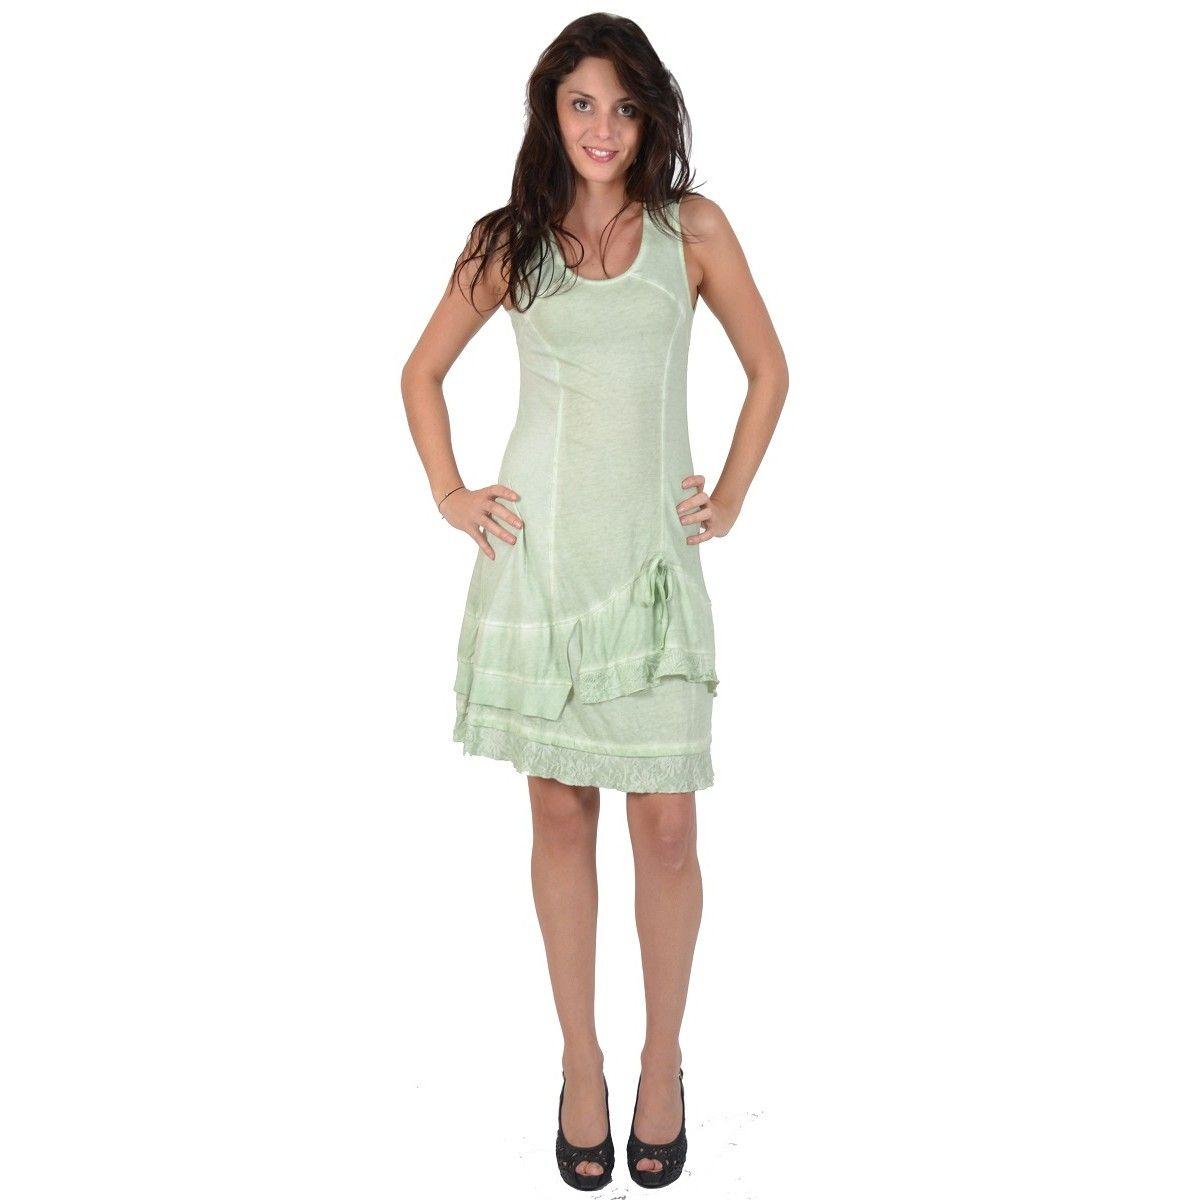 5909dfb38ba Robe sans manche Maloka couleur verte - Tifaine - Mode-lin.com ...